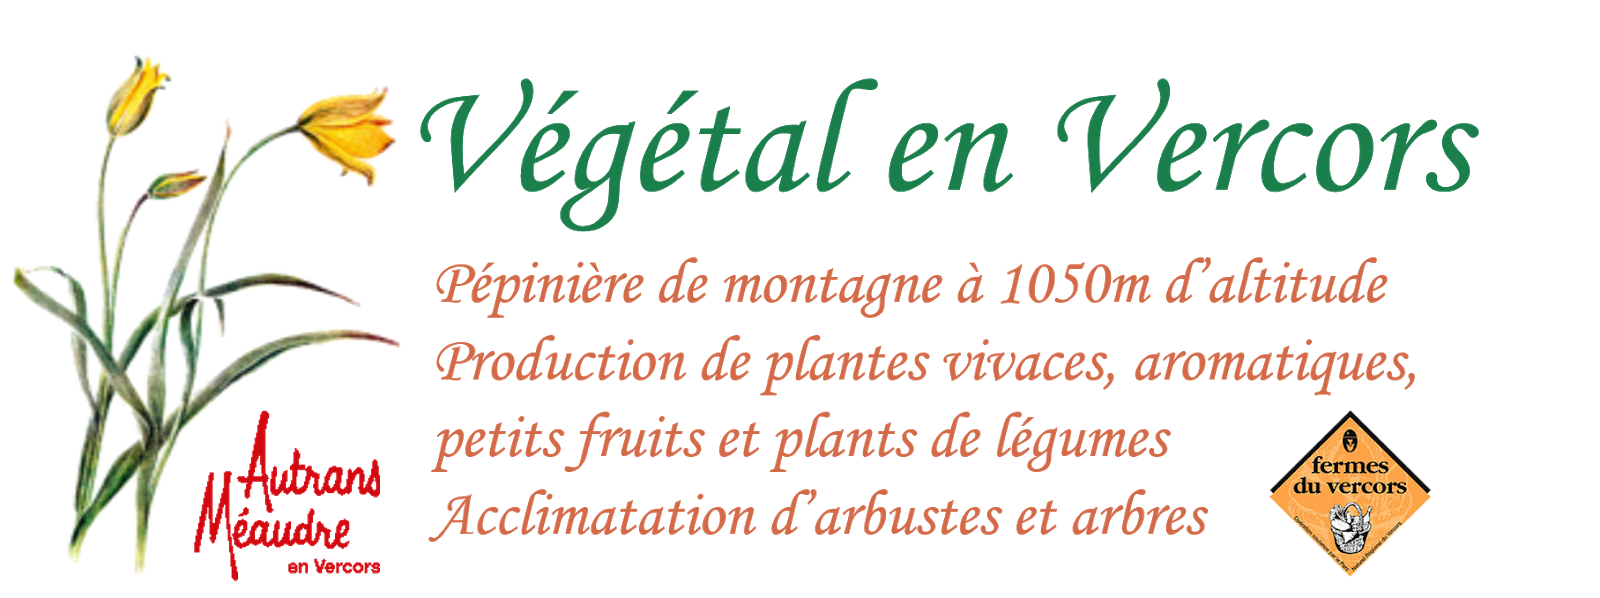 Végétal en Vercors